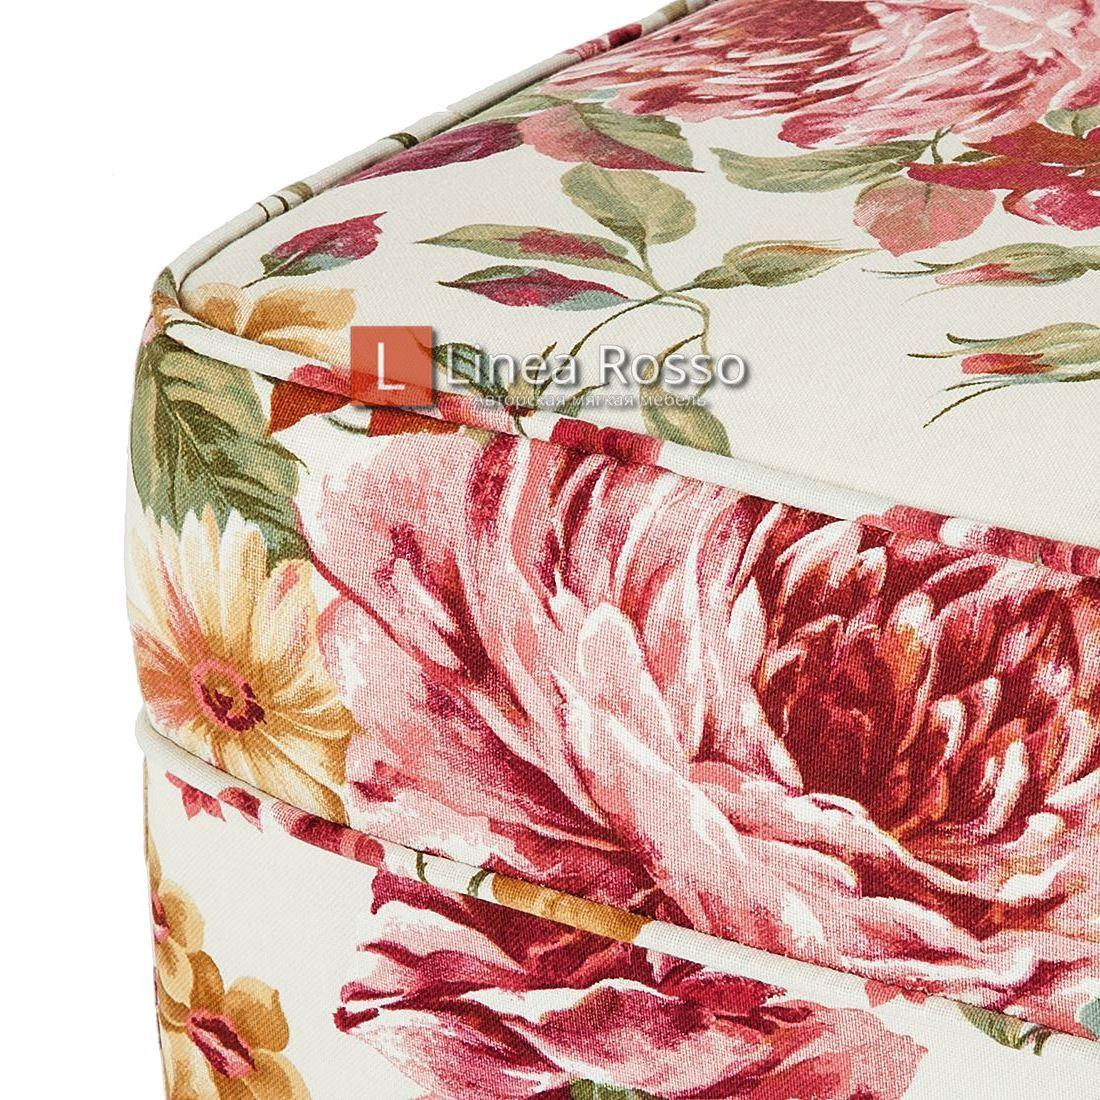 kreslo v tsvetochnyj print3 - Кресло с цветочным принтом на заказ